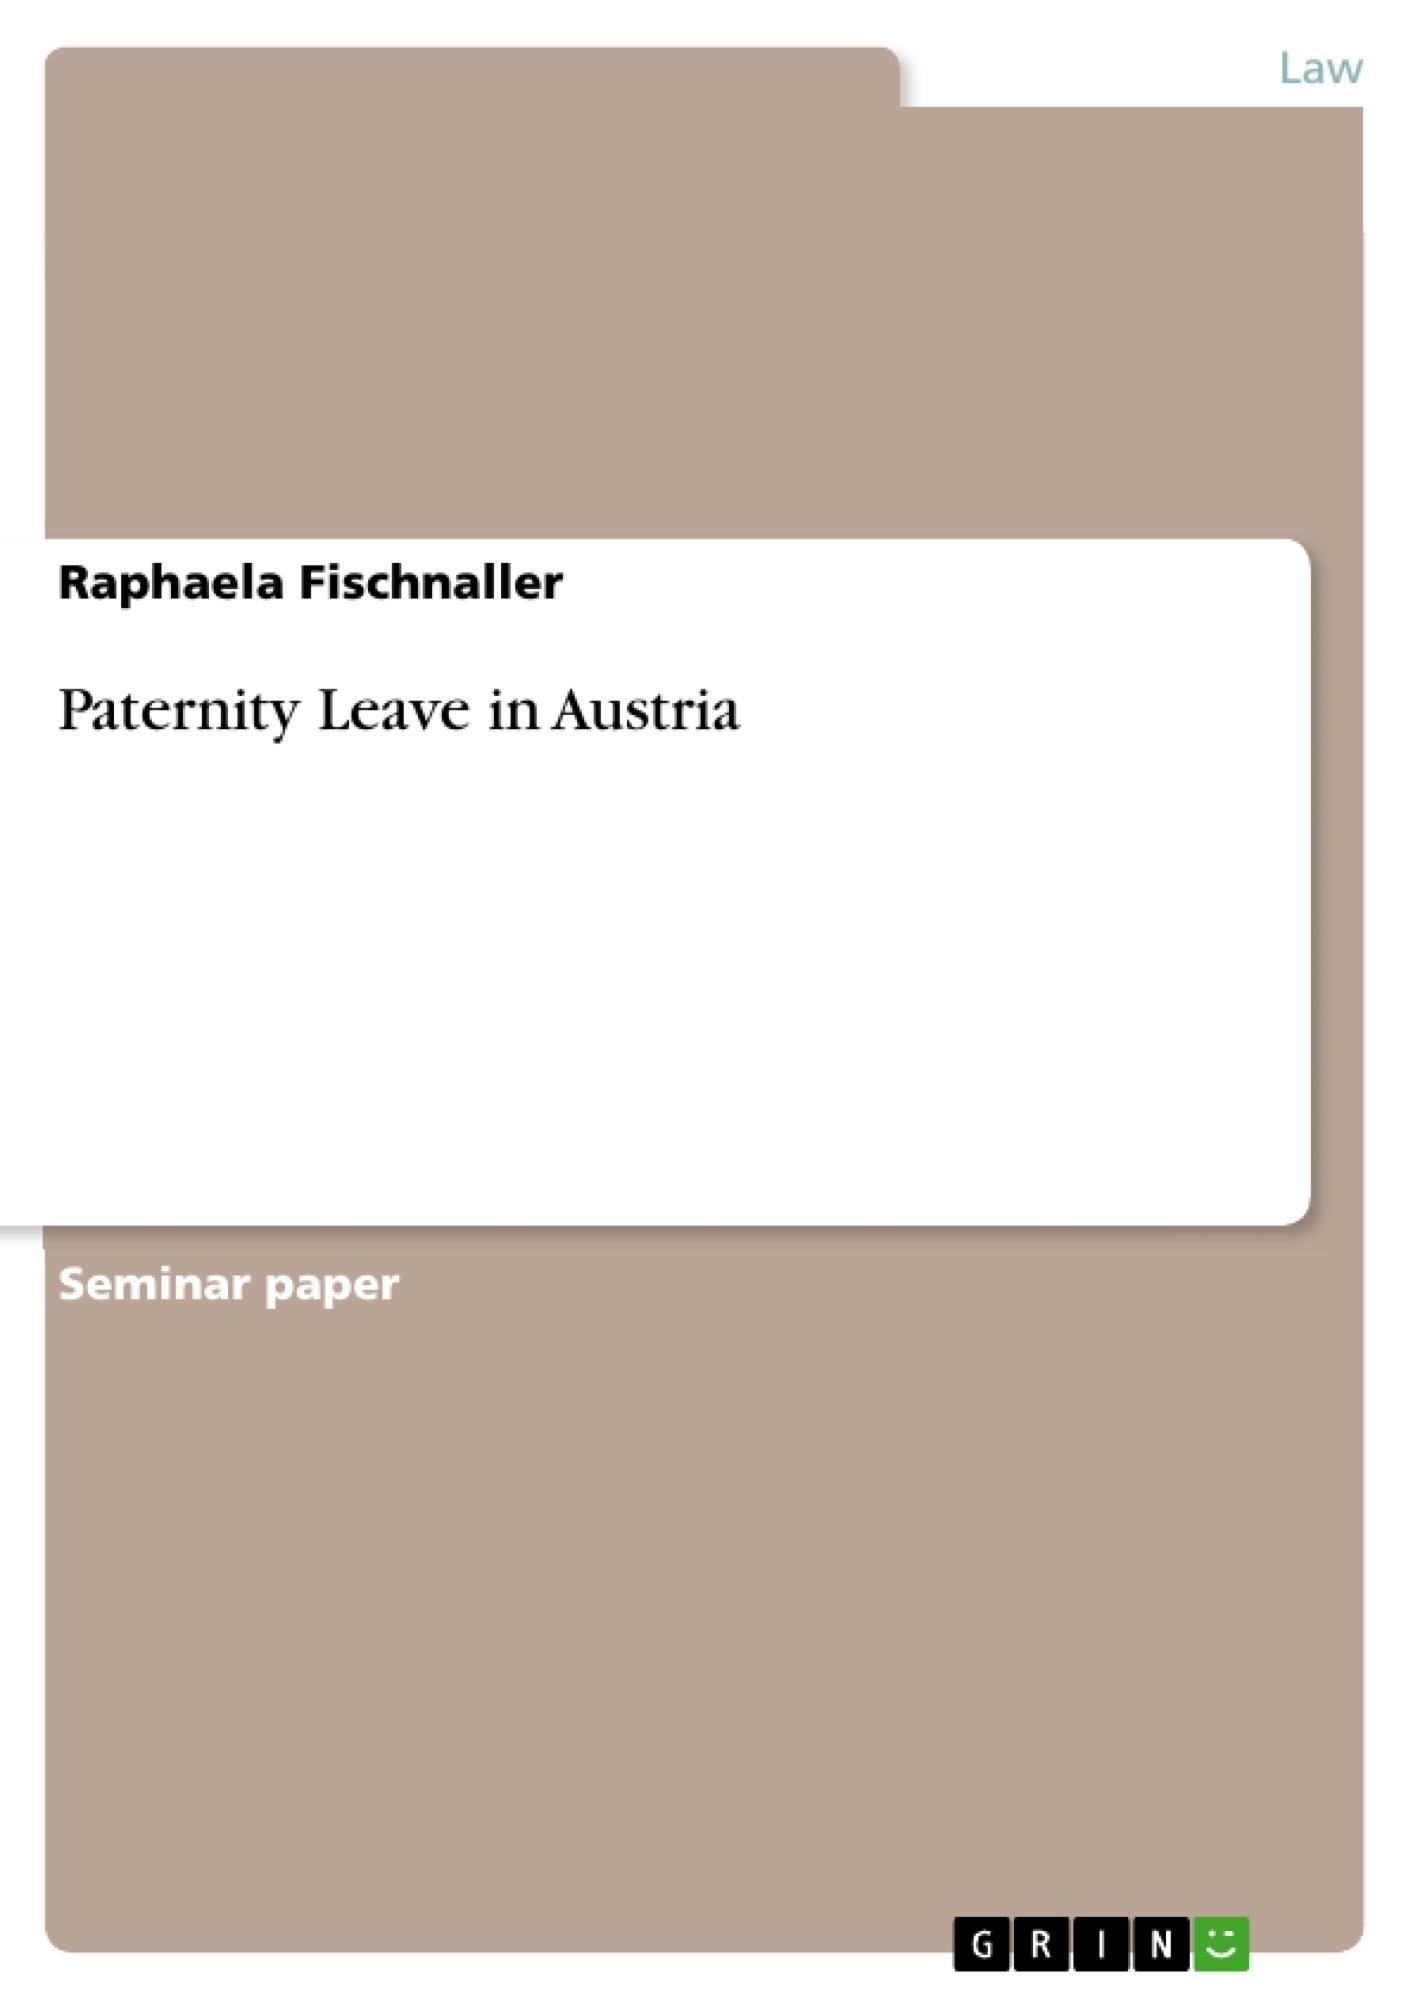 Title: Paternity Leave in Austria